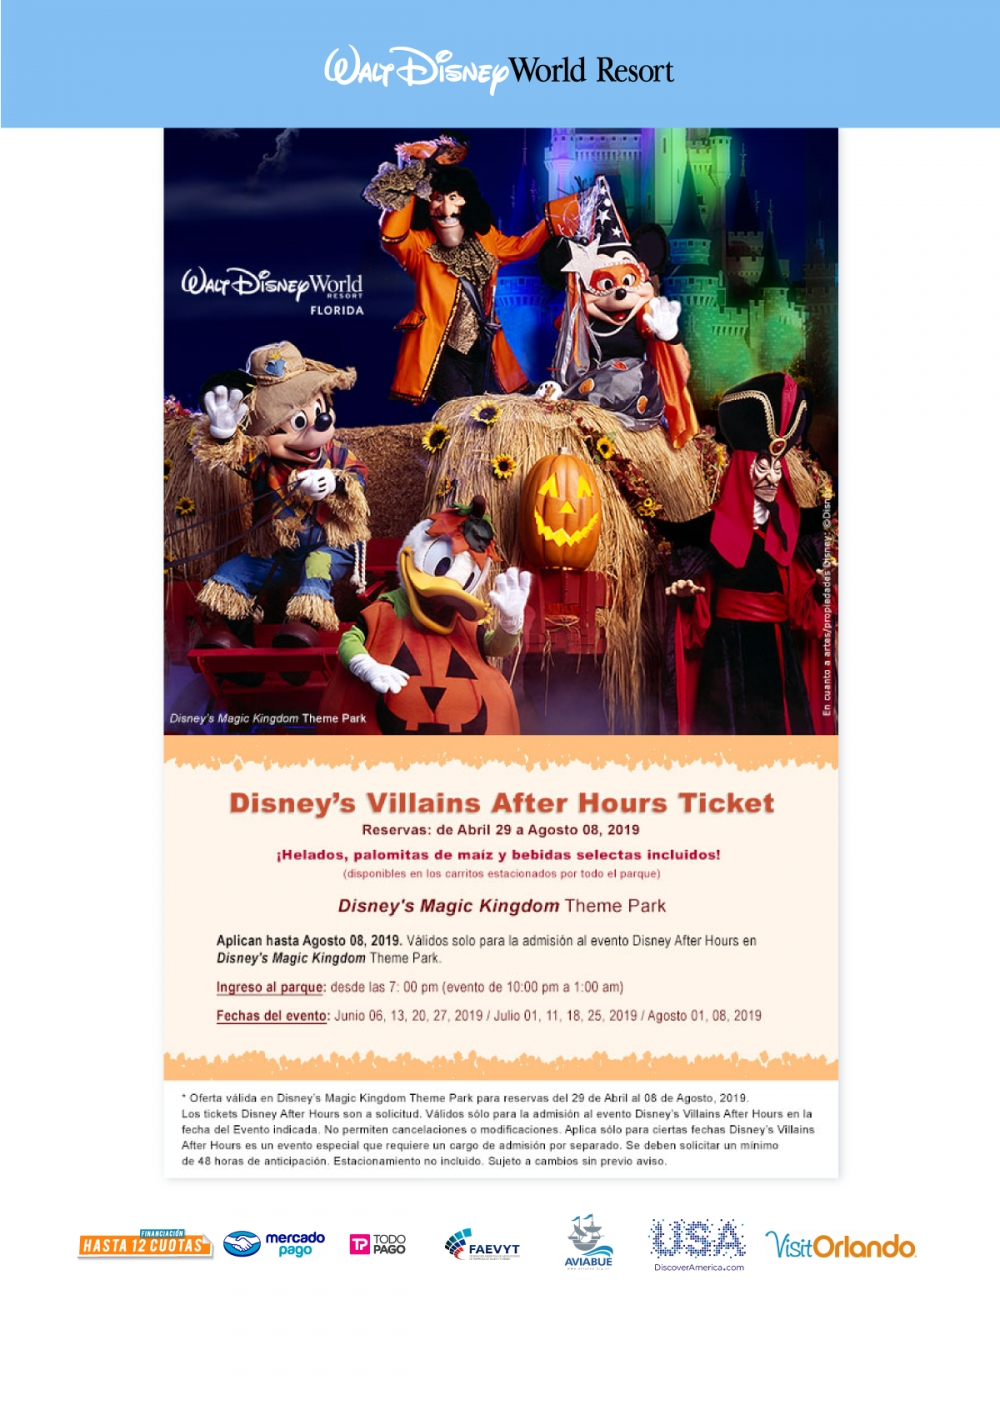 Walt Disney World - Disney's Villains After Hours Ticket